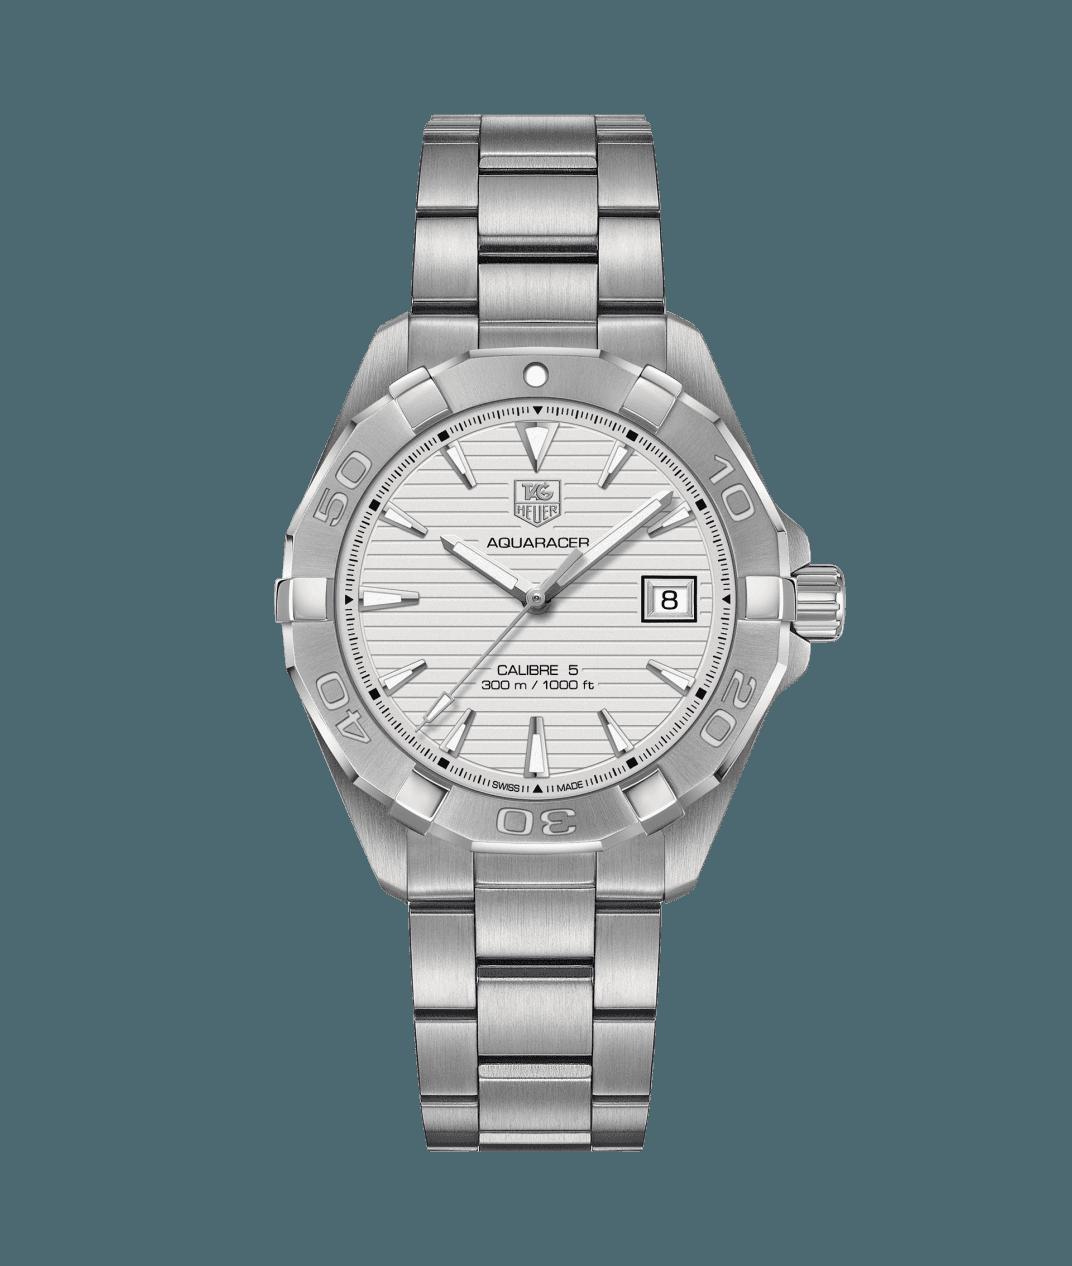 Tag-Heuer-Montre-Aquaracer-Calibre-5-40,5-mm-Hall-of-Time-WAY2111-BA0928